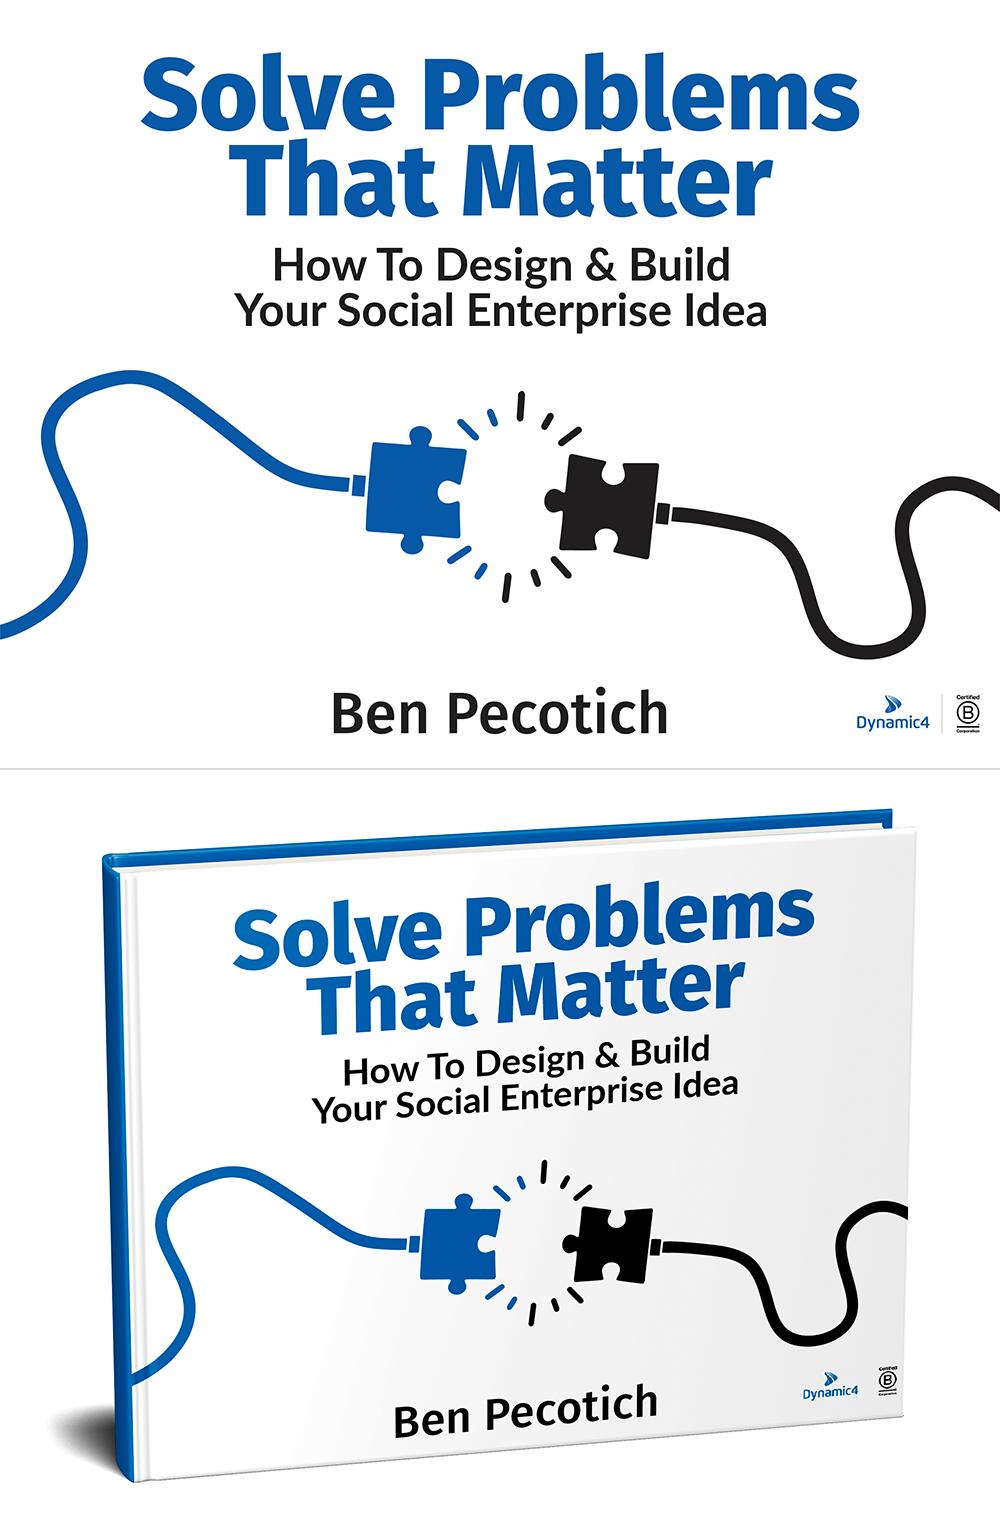 Solve Problems That Matter Cover Puzzle Click